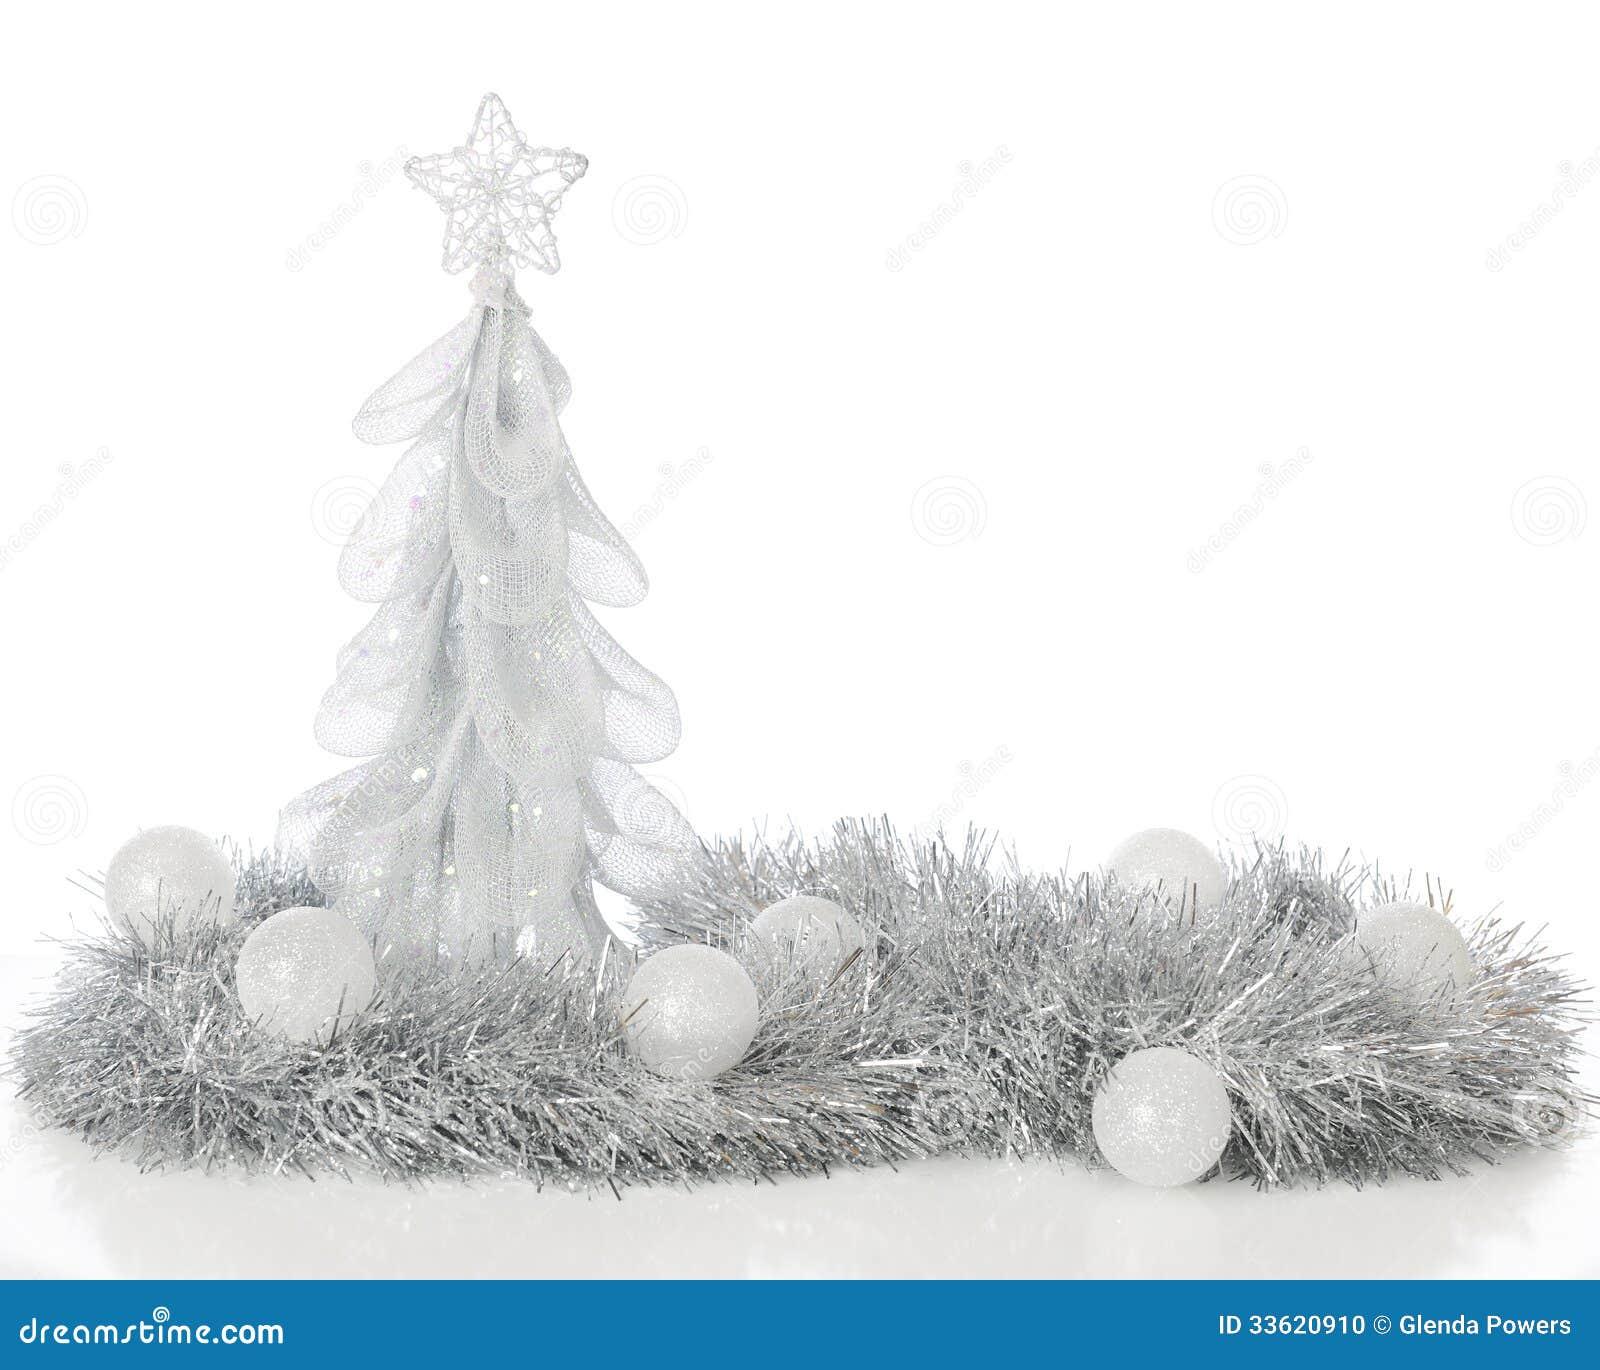 Frosty Christmas Tree